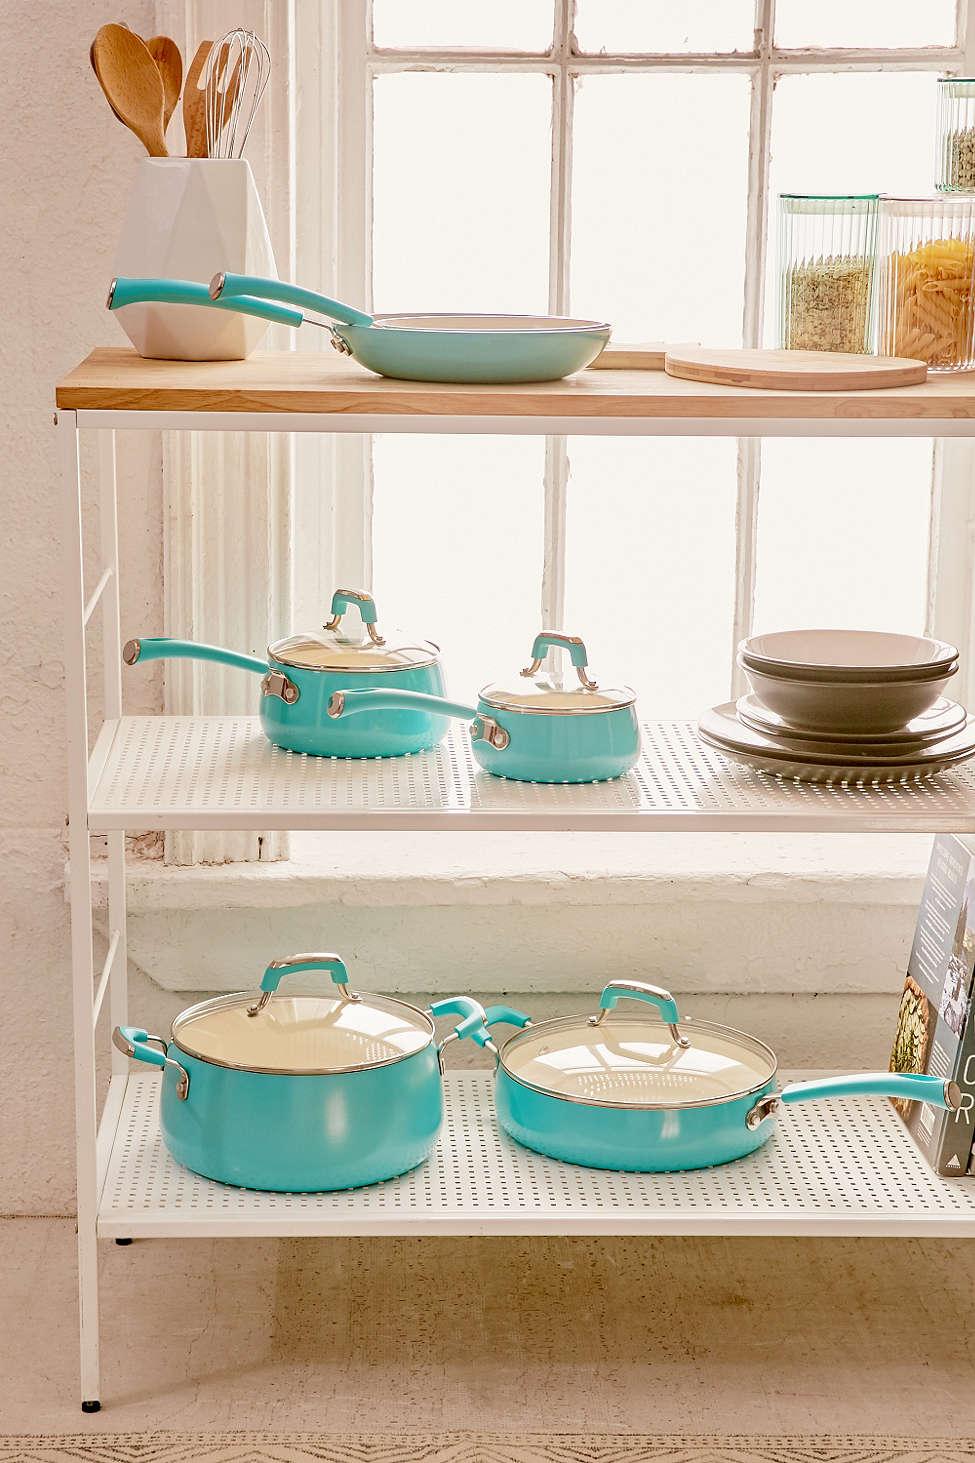 Aqua Turquoise Toaster Novocom Top